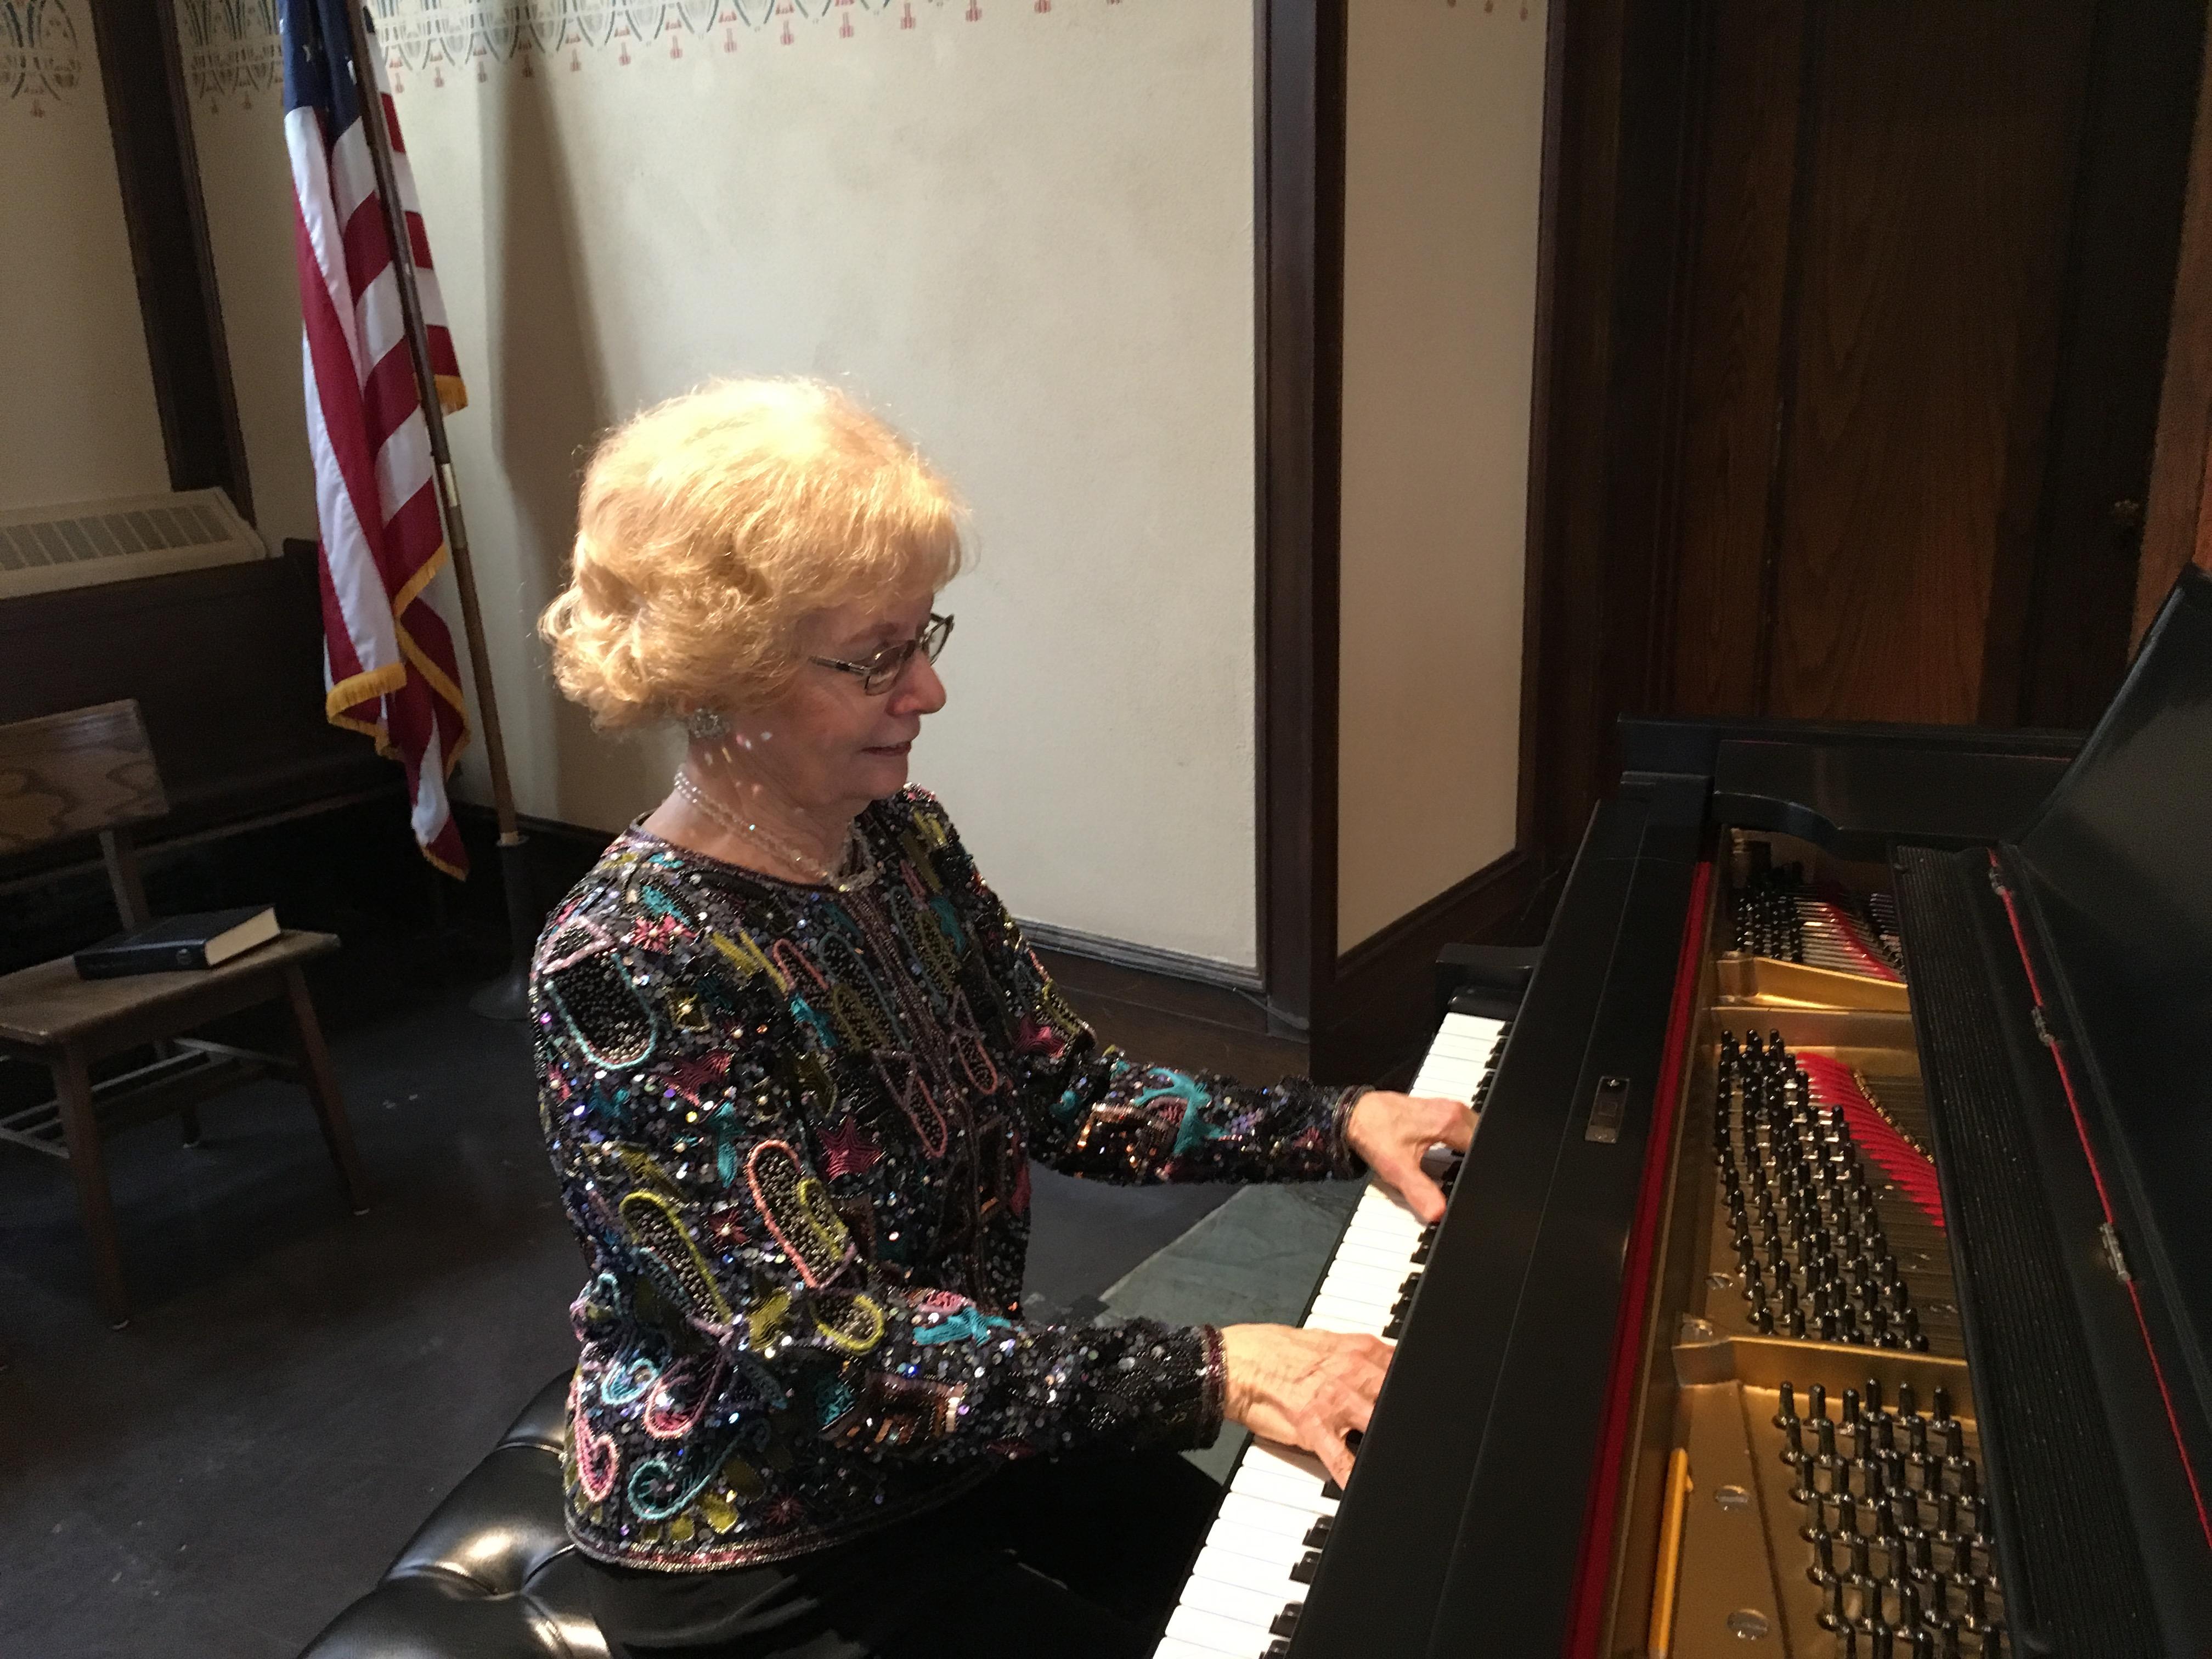 WSMC Margaret at piano 95th Anniv Concert 1-24-16 IMG_0735